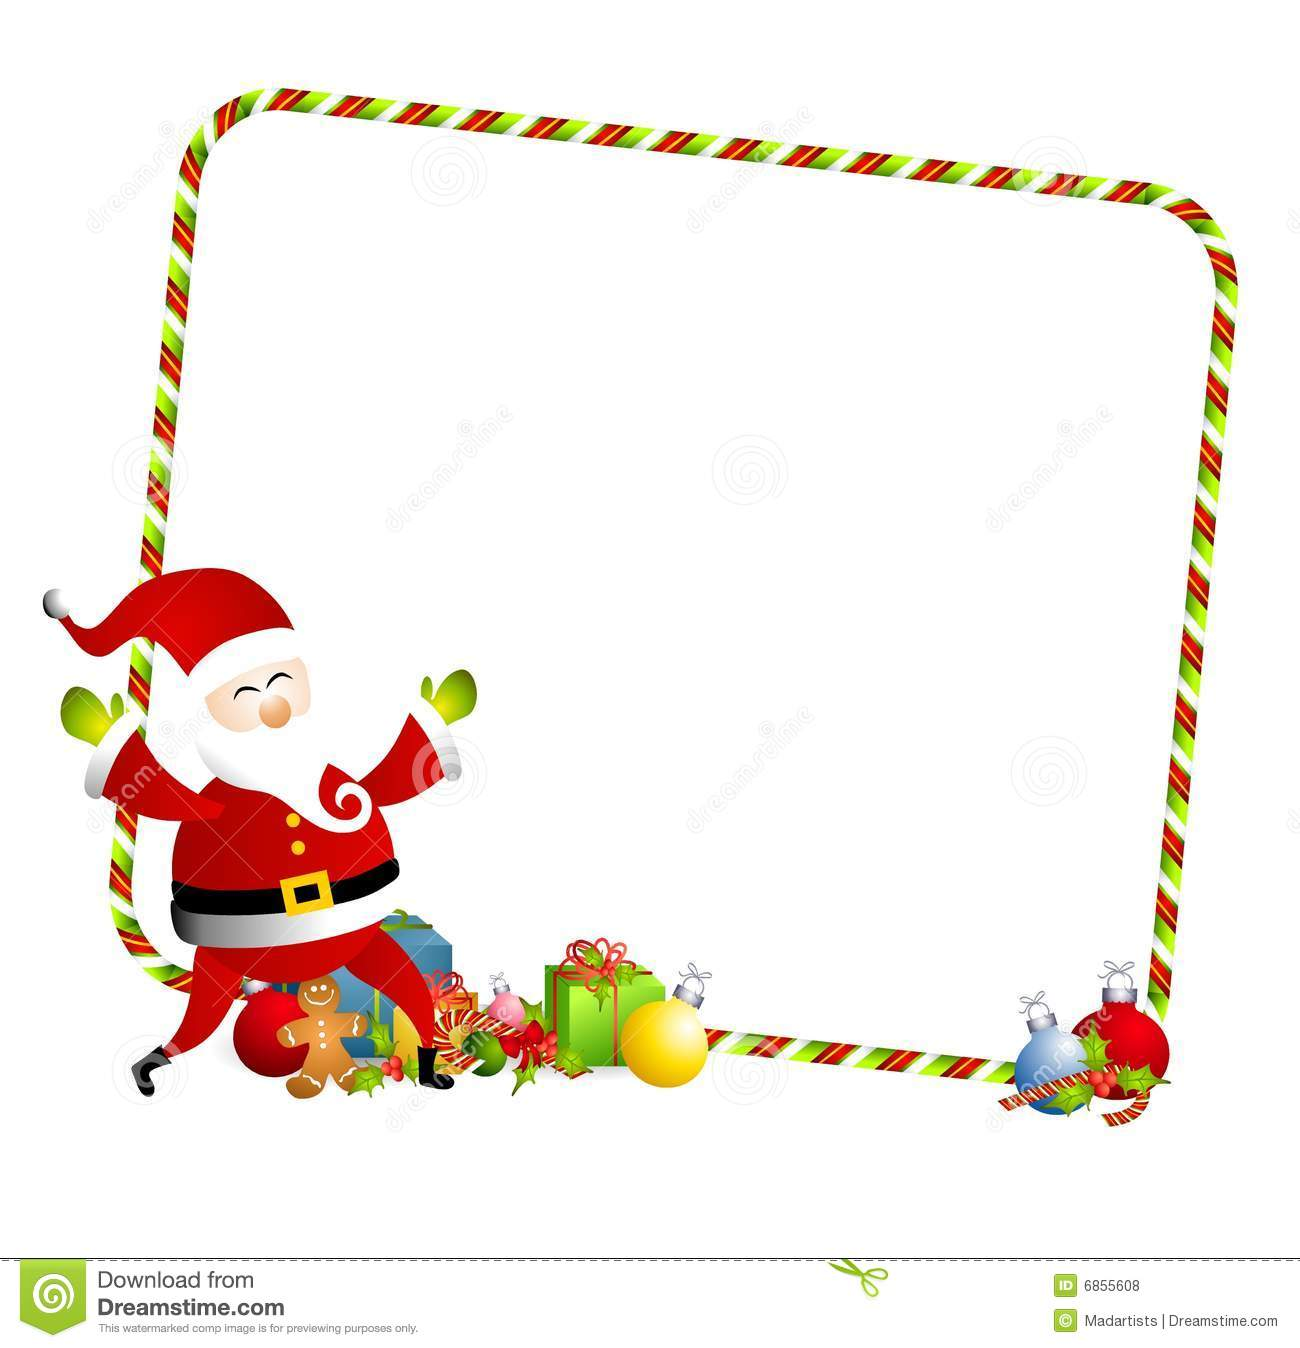 Santa border clipart clip royalty free stock Santa border clipart » Clipart Station clip royalty free stock